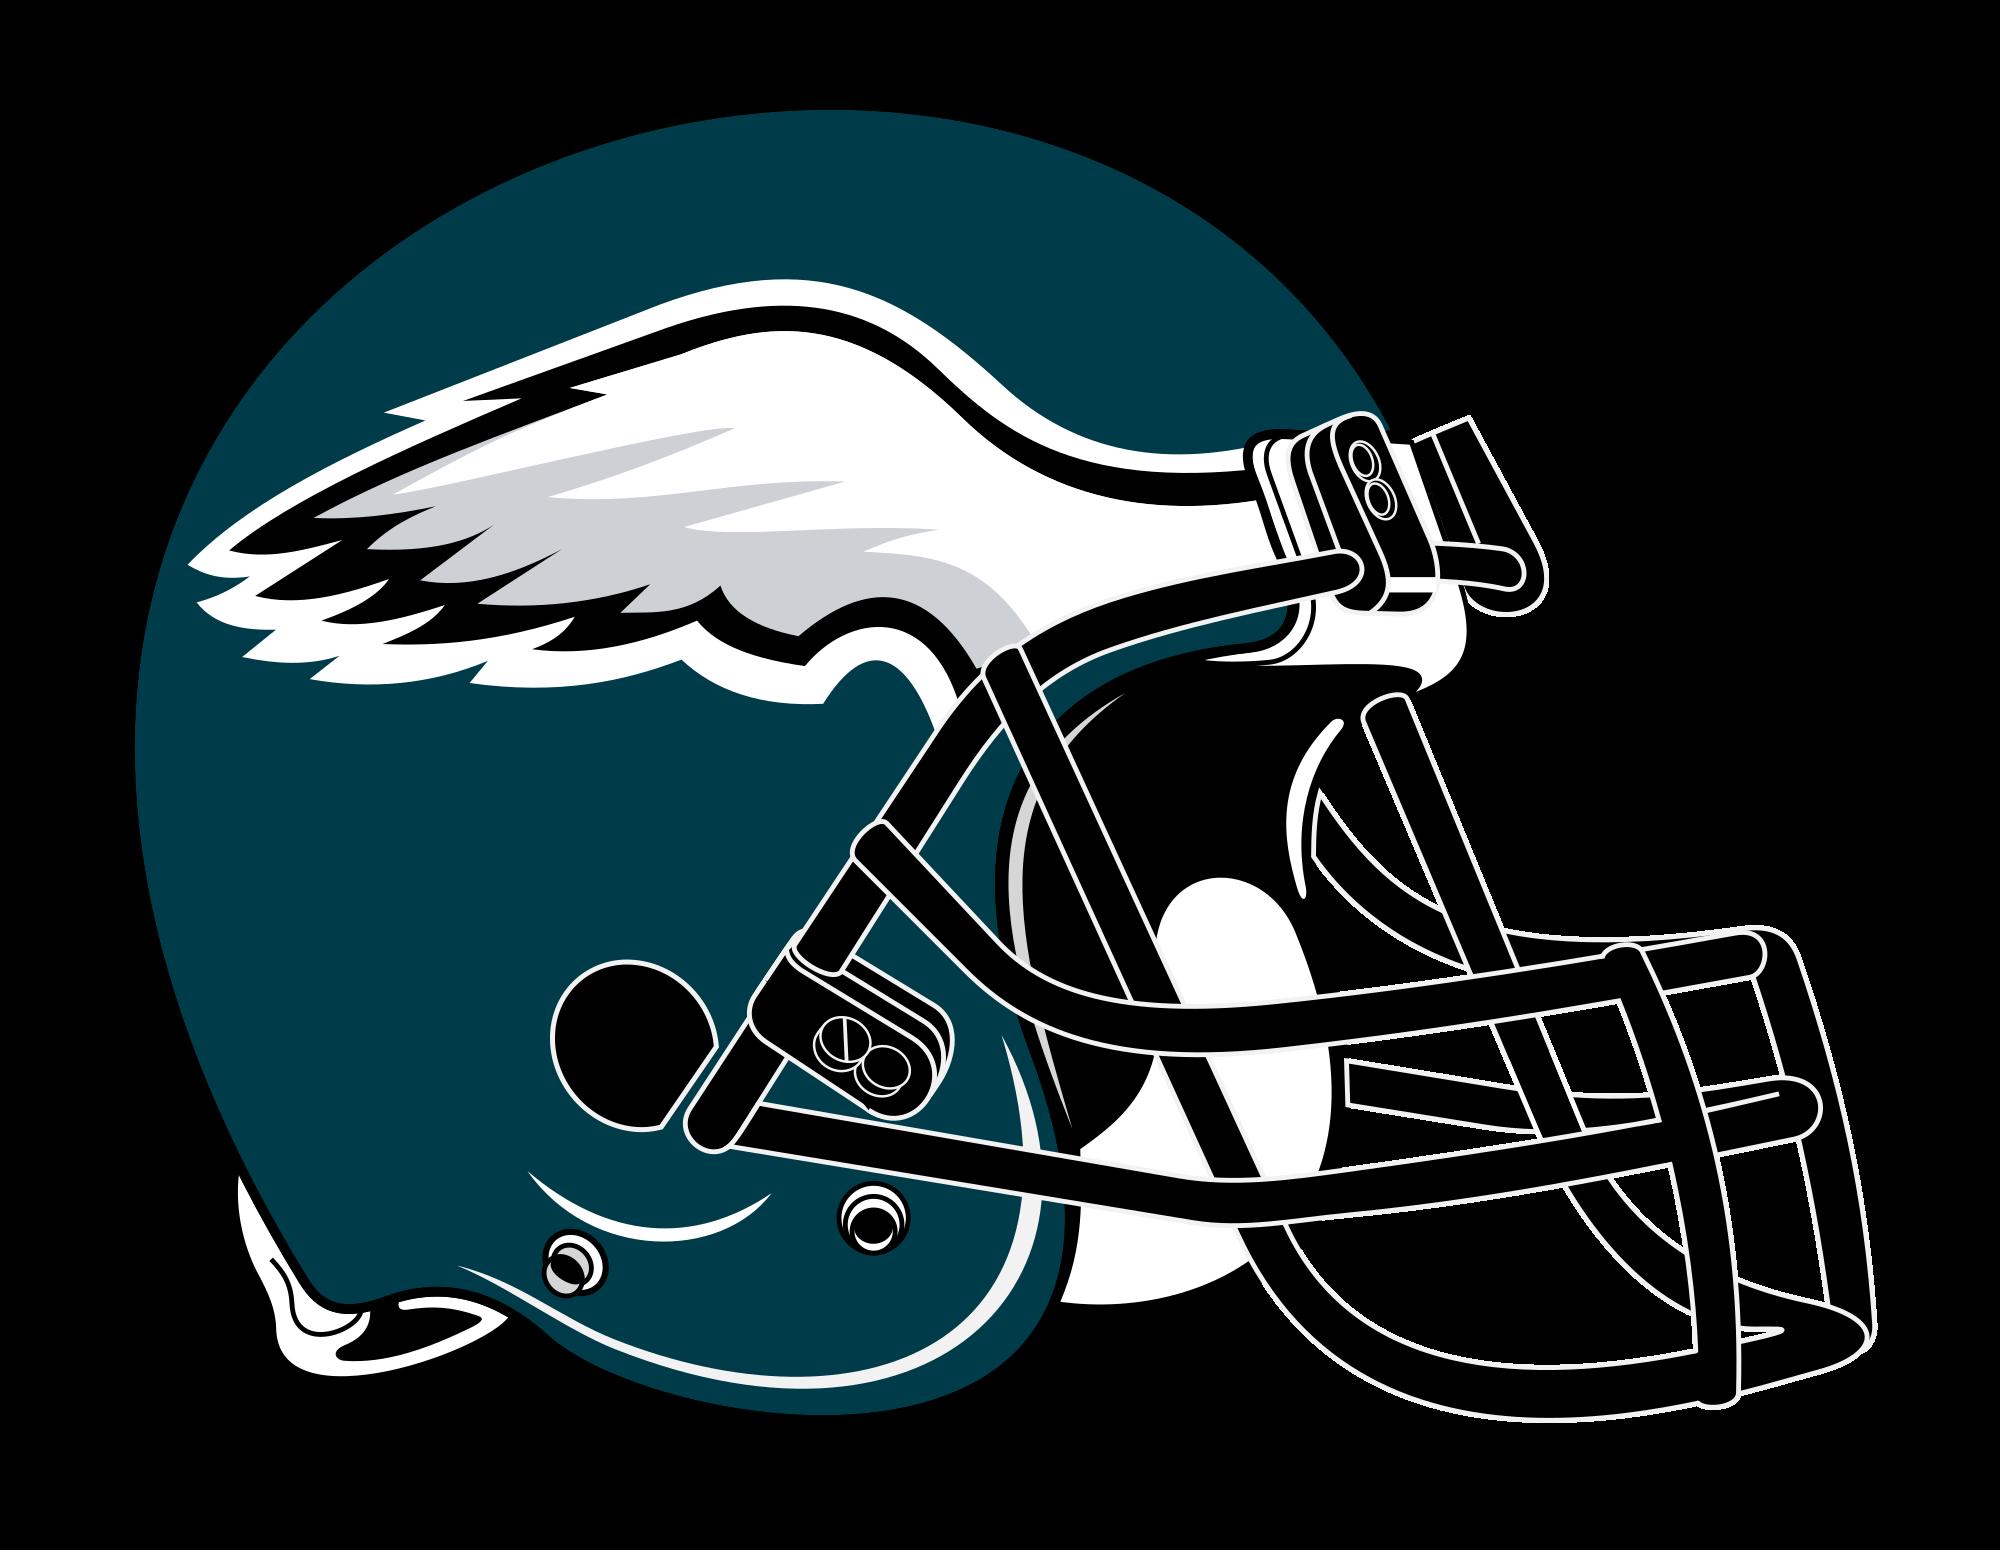 Eagles helmet png. Datei philadelphia rightface svg